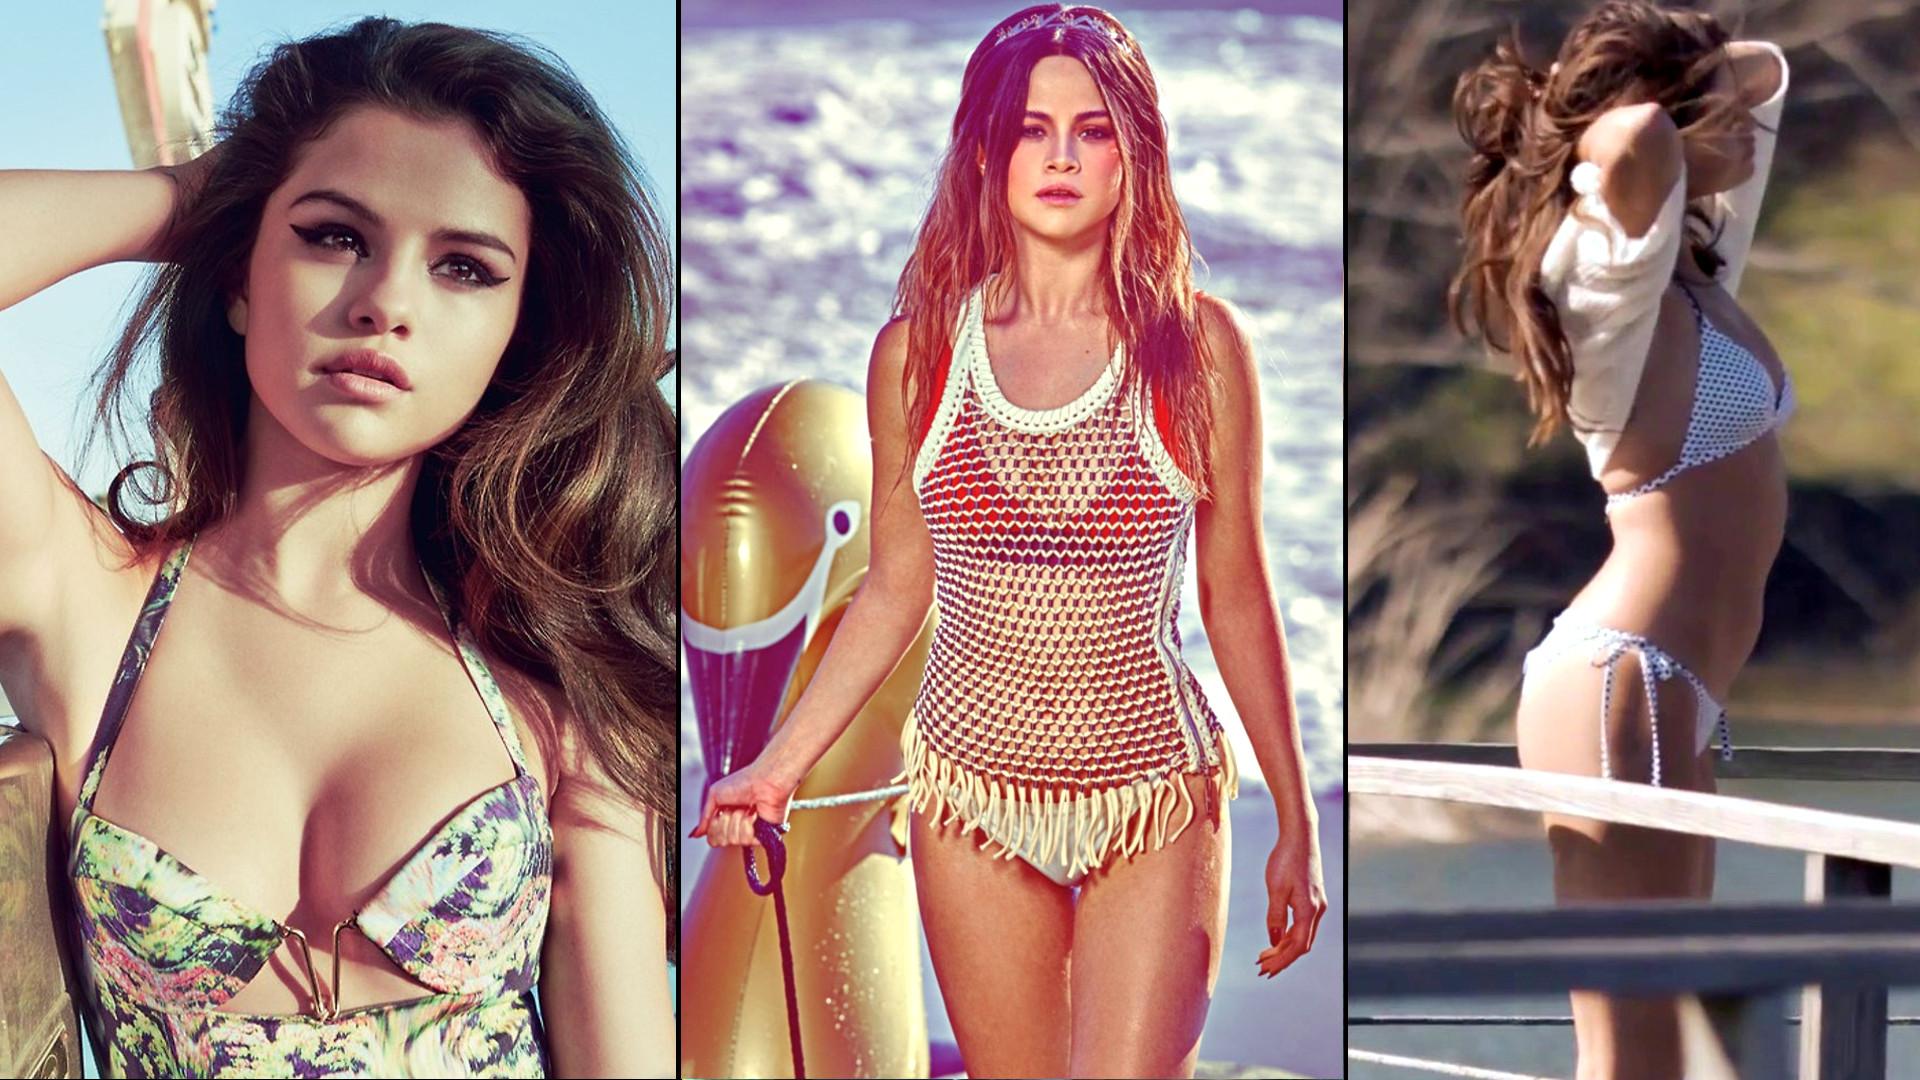 Selena Gomez hot Photoshoot and Glamour Pics Gallery